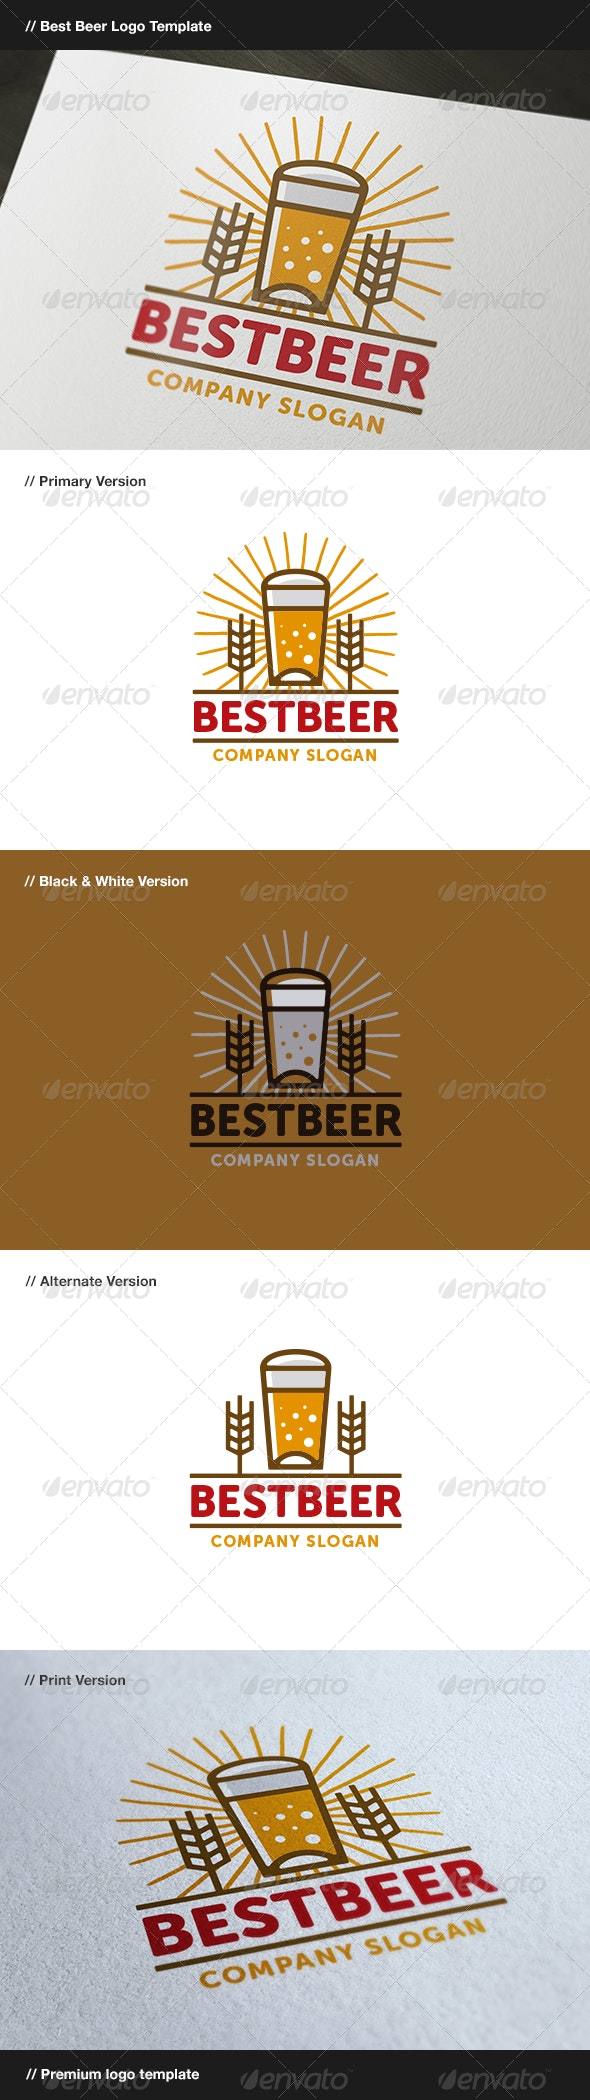 Best Beer - Food Logo Templates